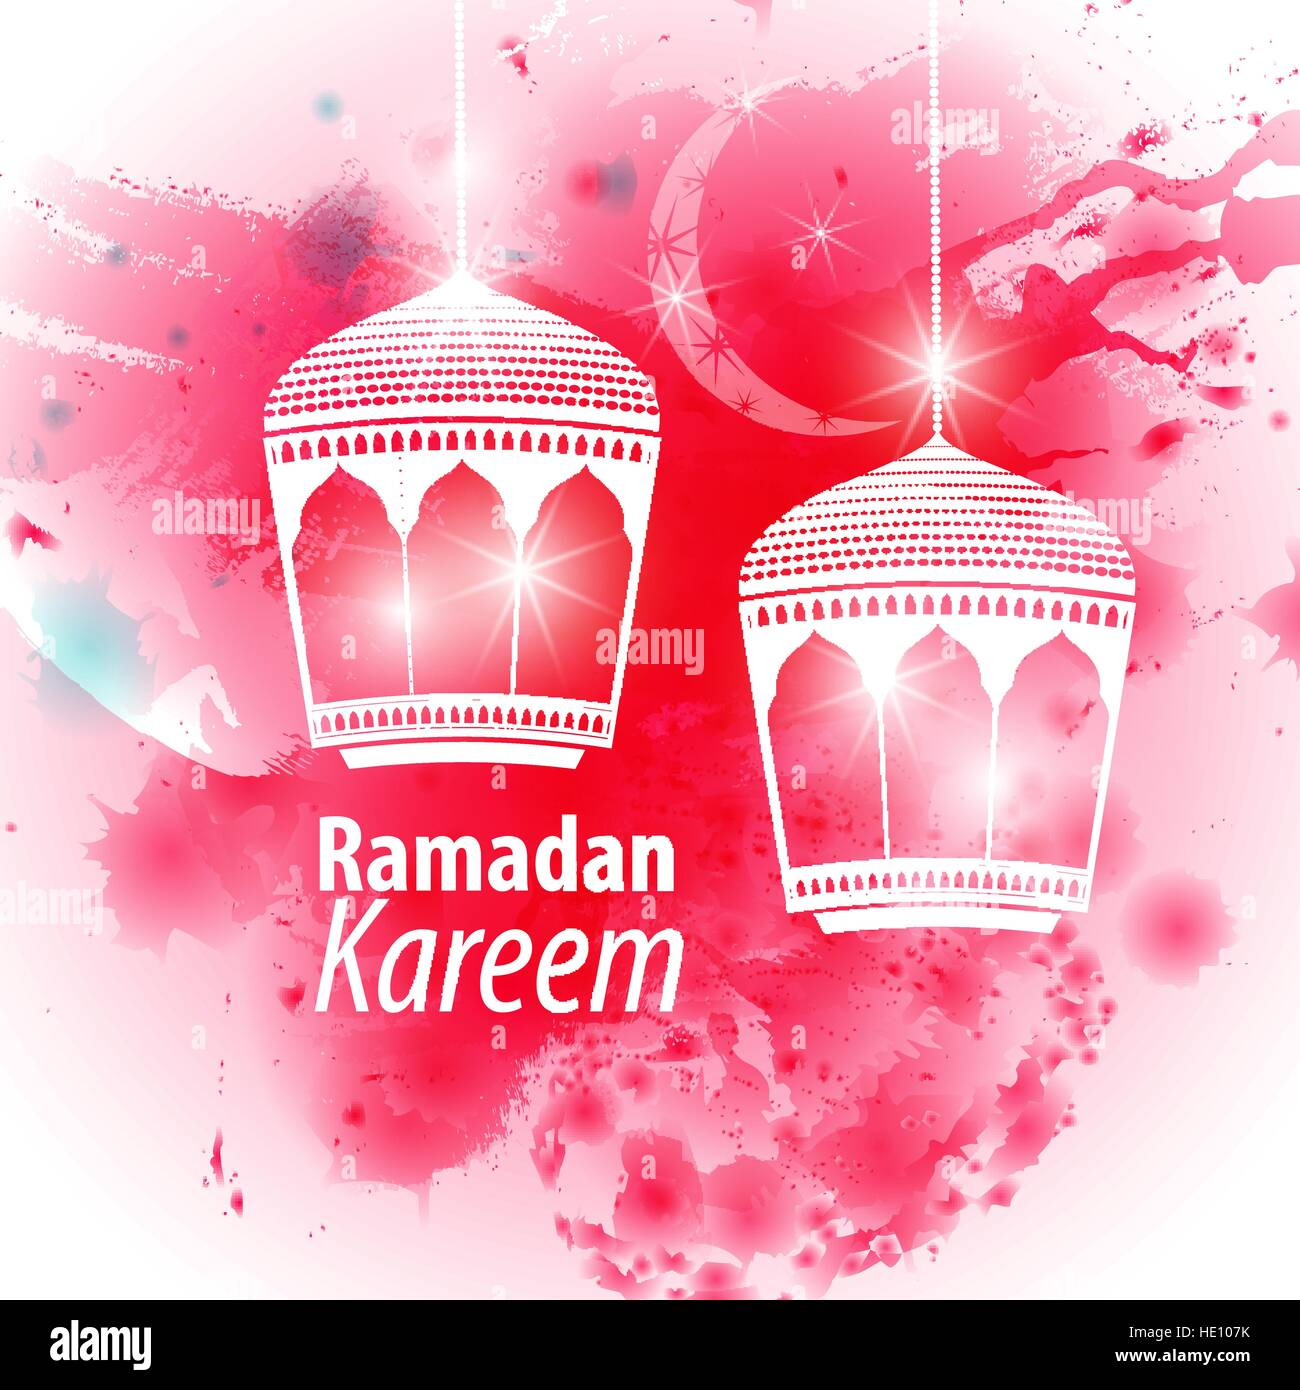 Watercolor pink blob illustration ramadan kareem mubarak beautiful watercolor pink blob illustration ramadan kareem mubarak beautiful islamic stylized lantern traditional greeting card wishes holy month and karim m4hsunfo